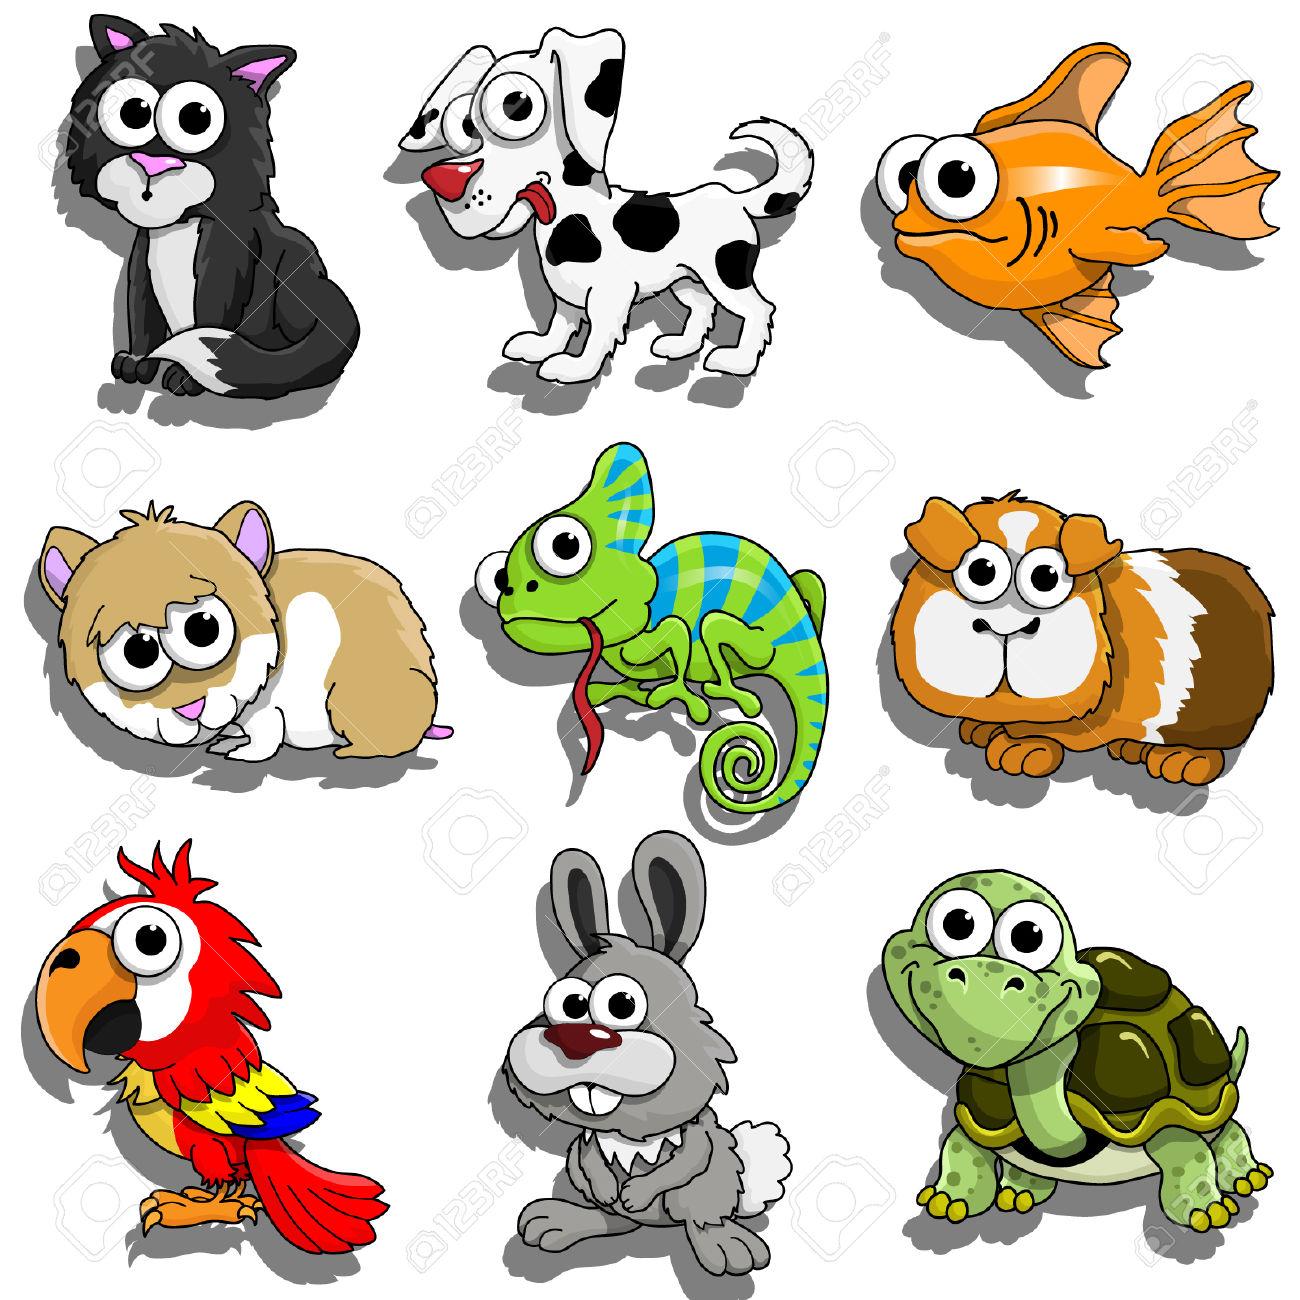 Pet animals clipart 7 » Clipart Station.